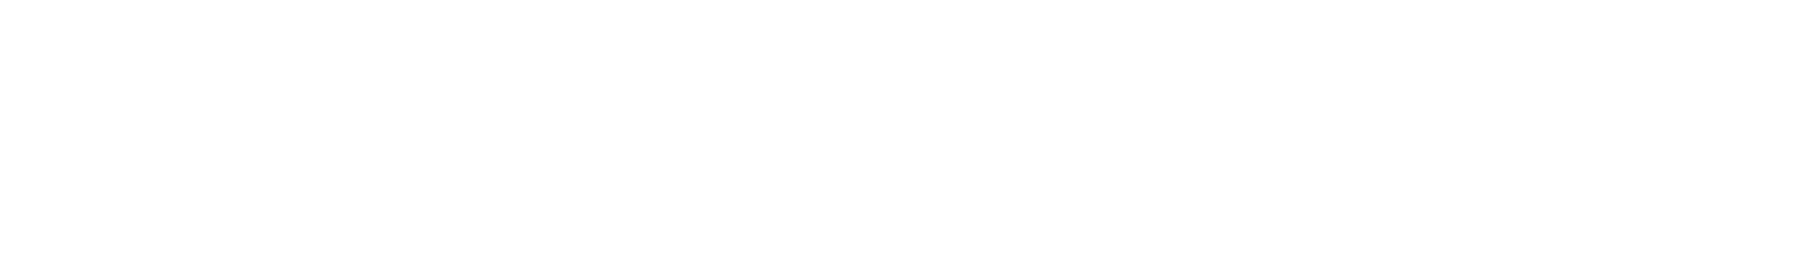 blbc jazzydrums 75 03